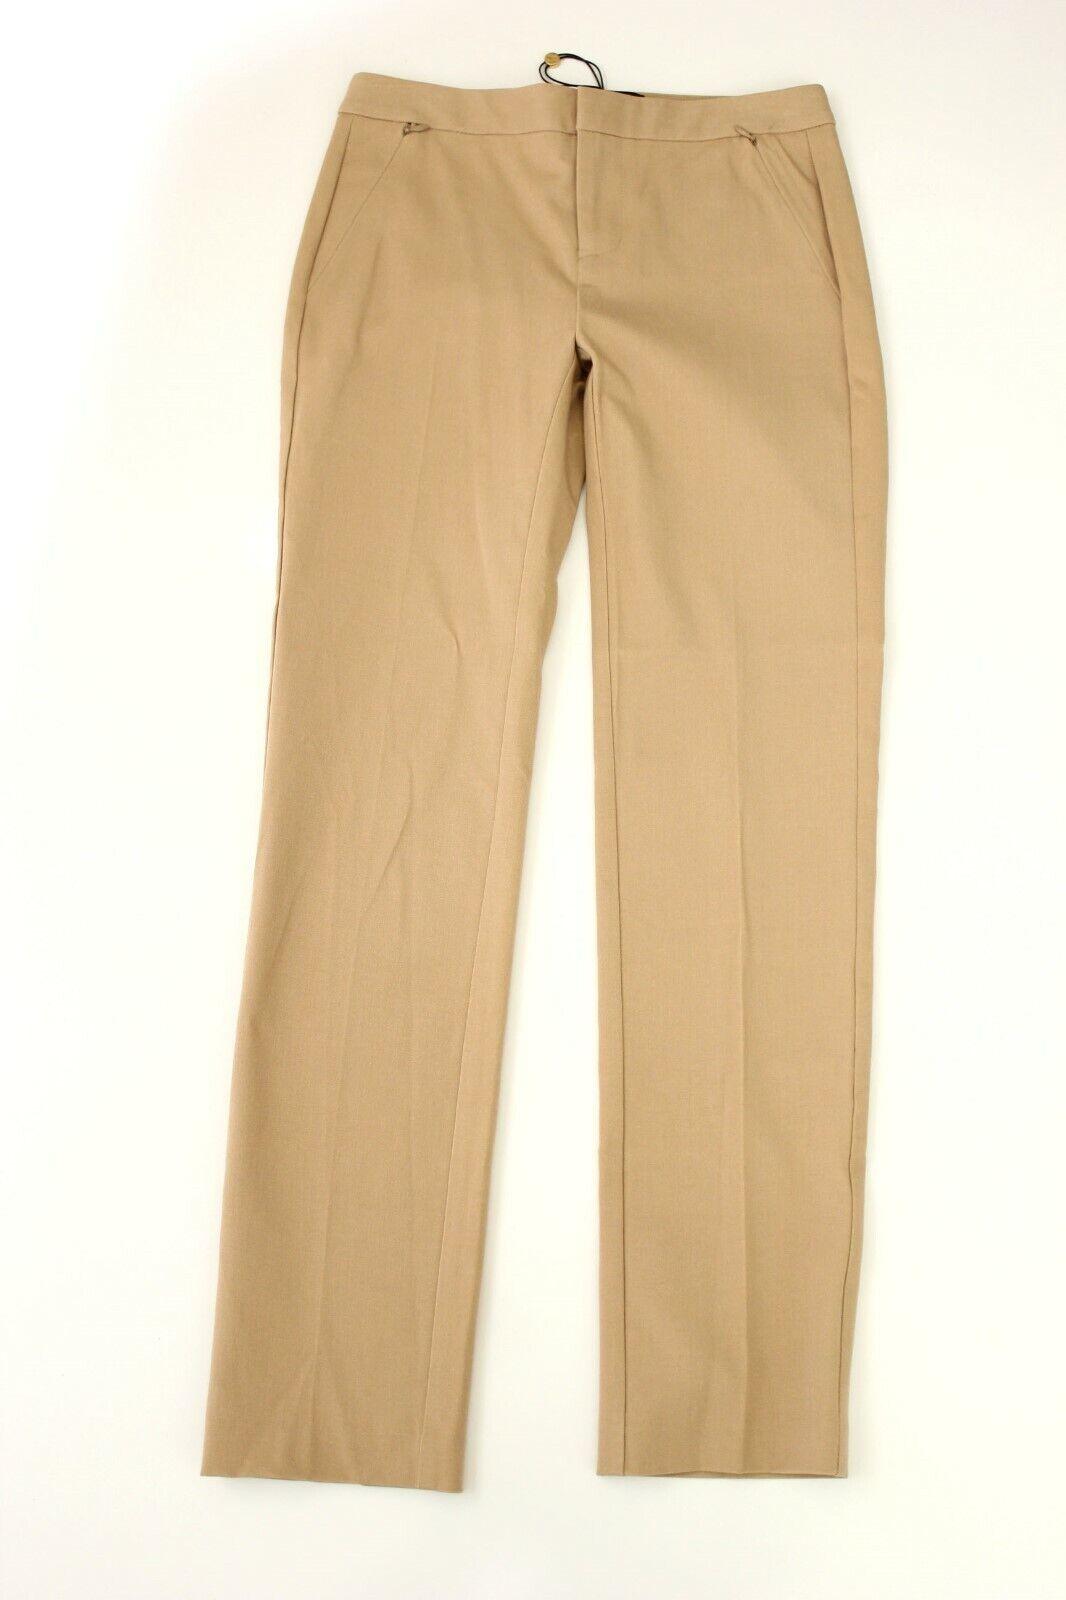 KOBI HALPERIN Khaki Straight Leg Alexandra Pants 0  248